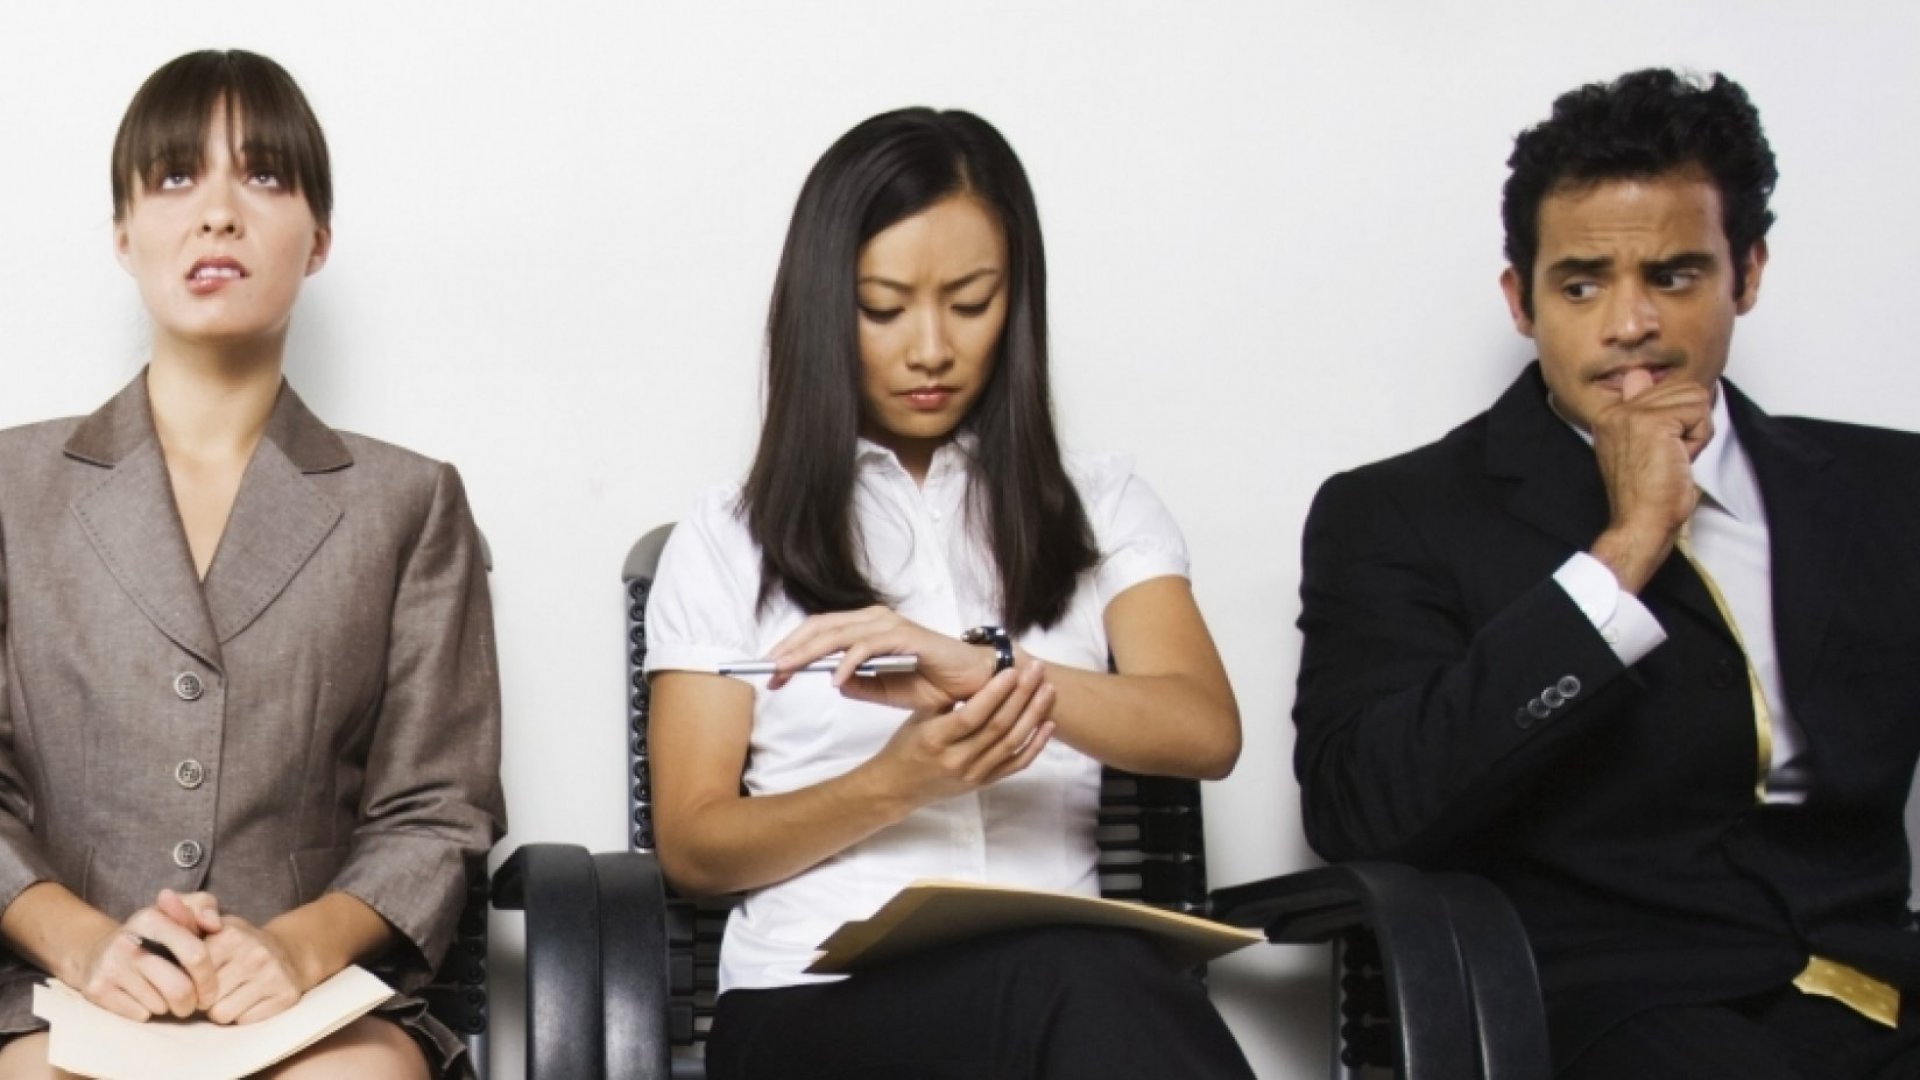 10 Boneheaded Resume Mistakes That Guarantee You Won't Get the Job